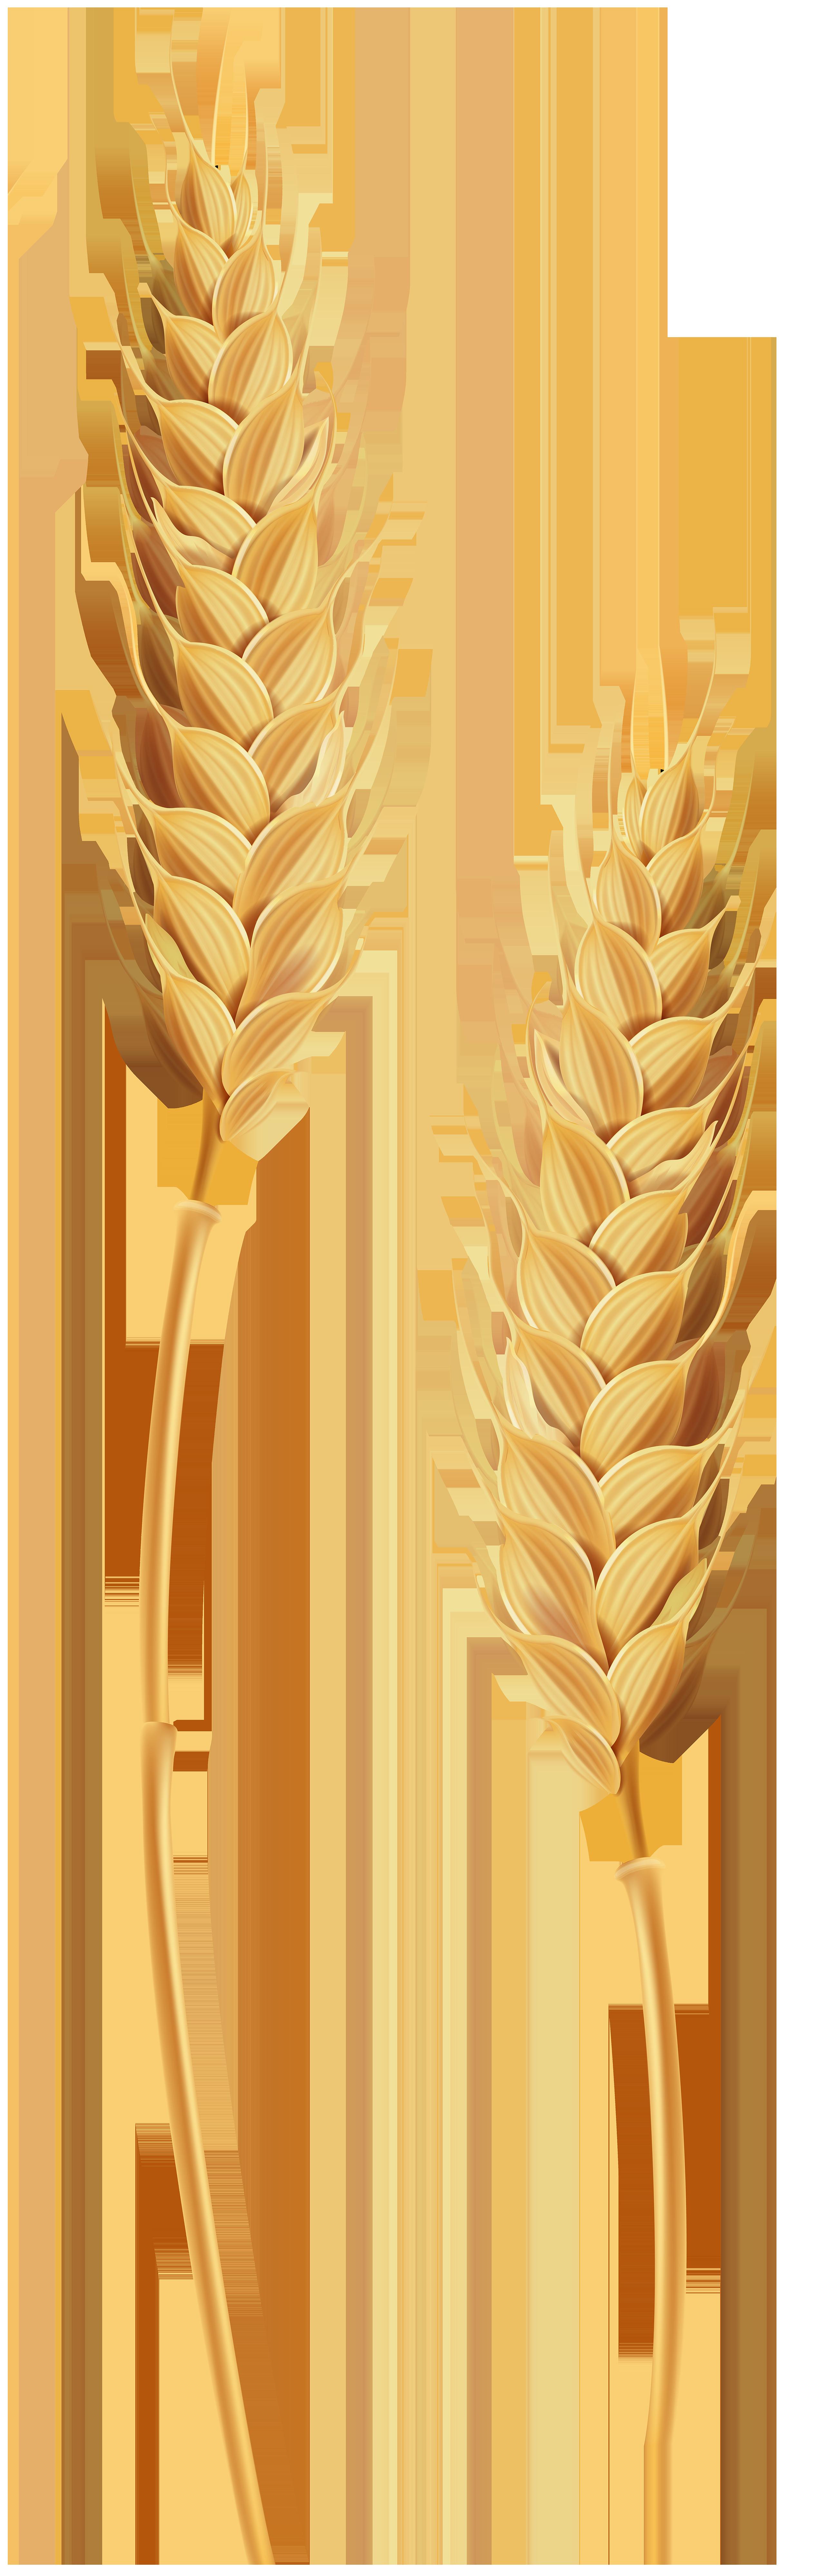 Wheat clipart transparent background. Stalks clip art image